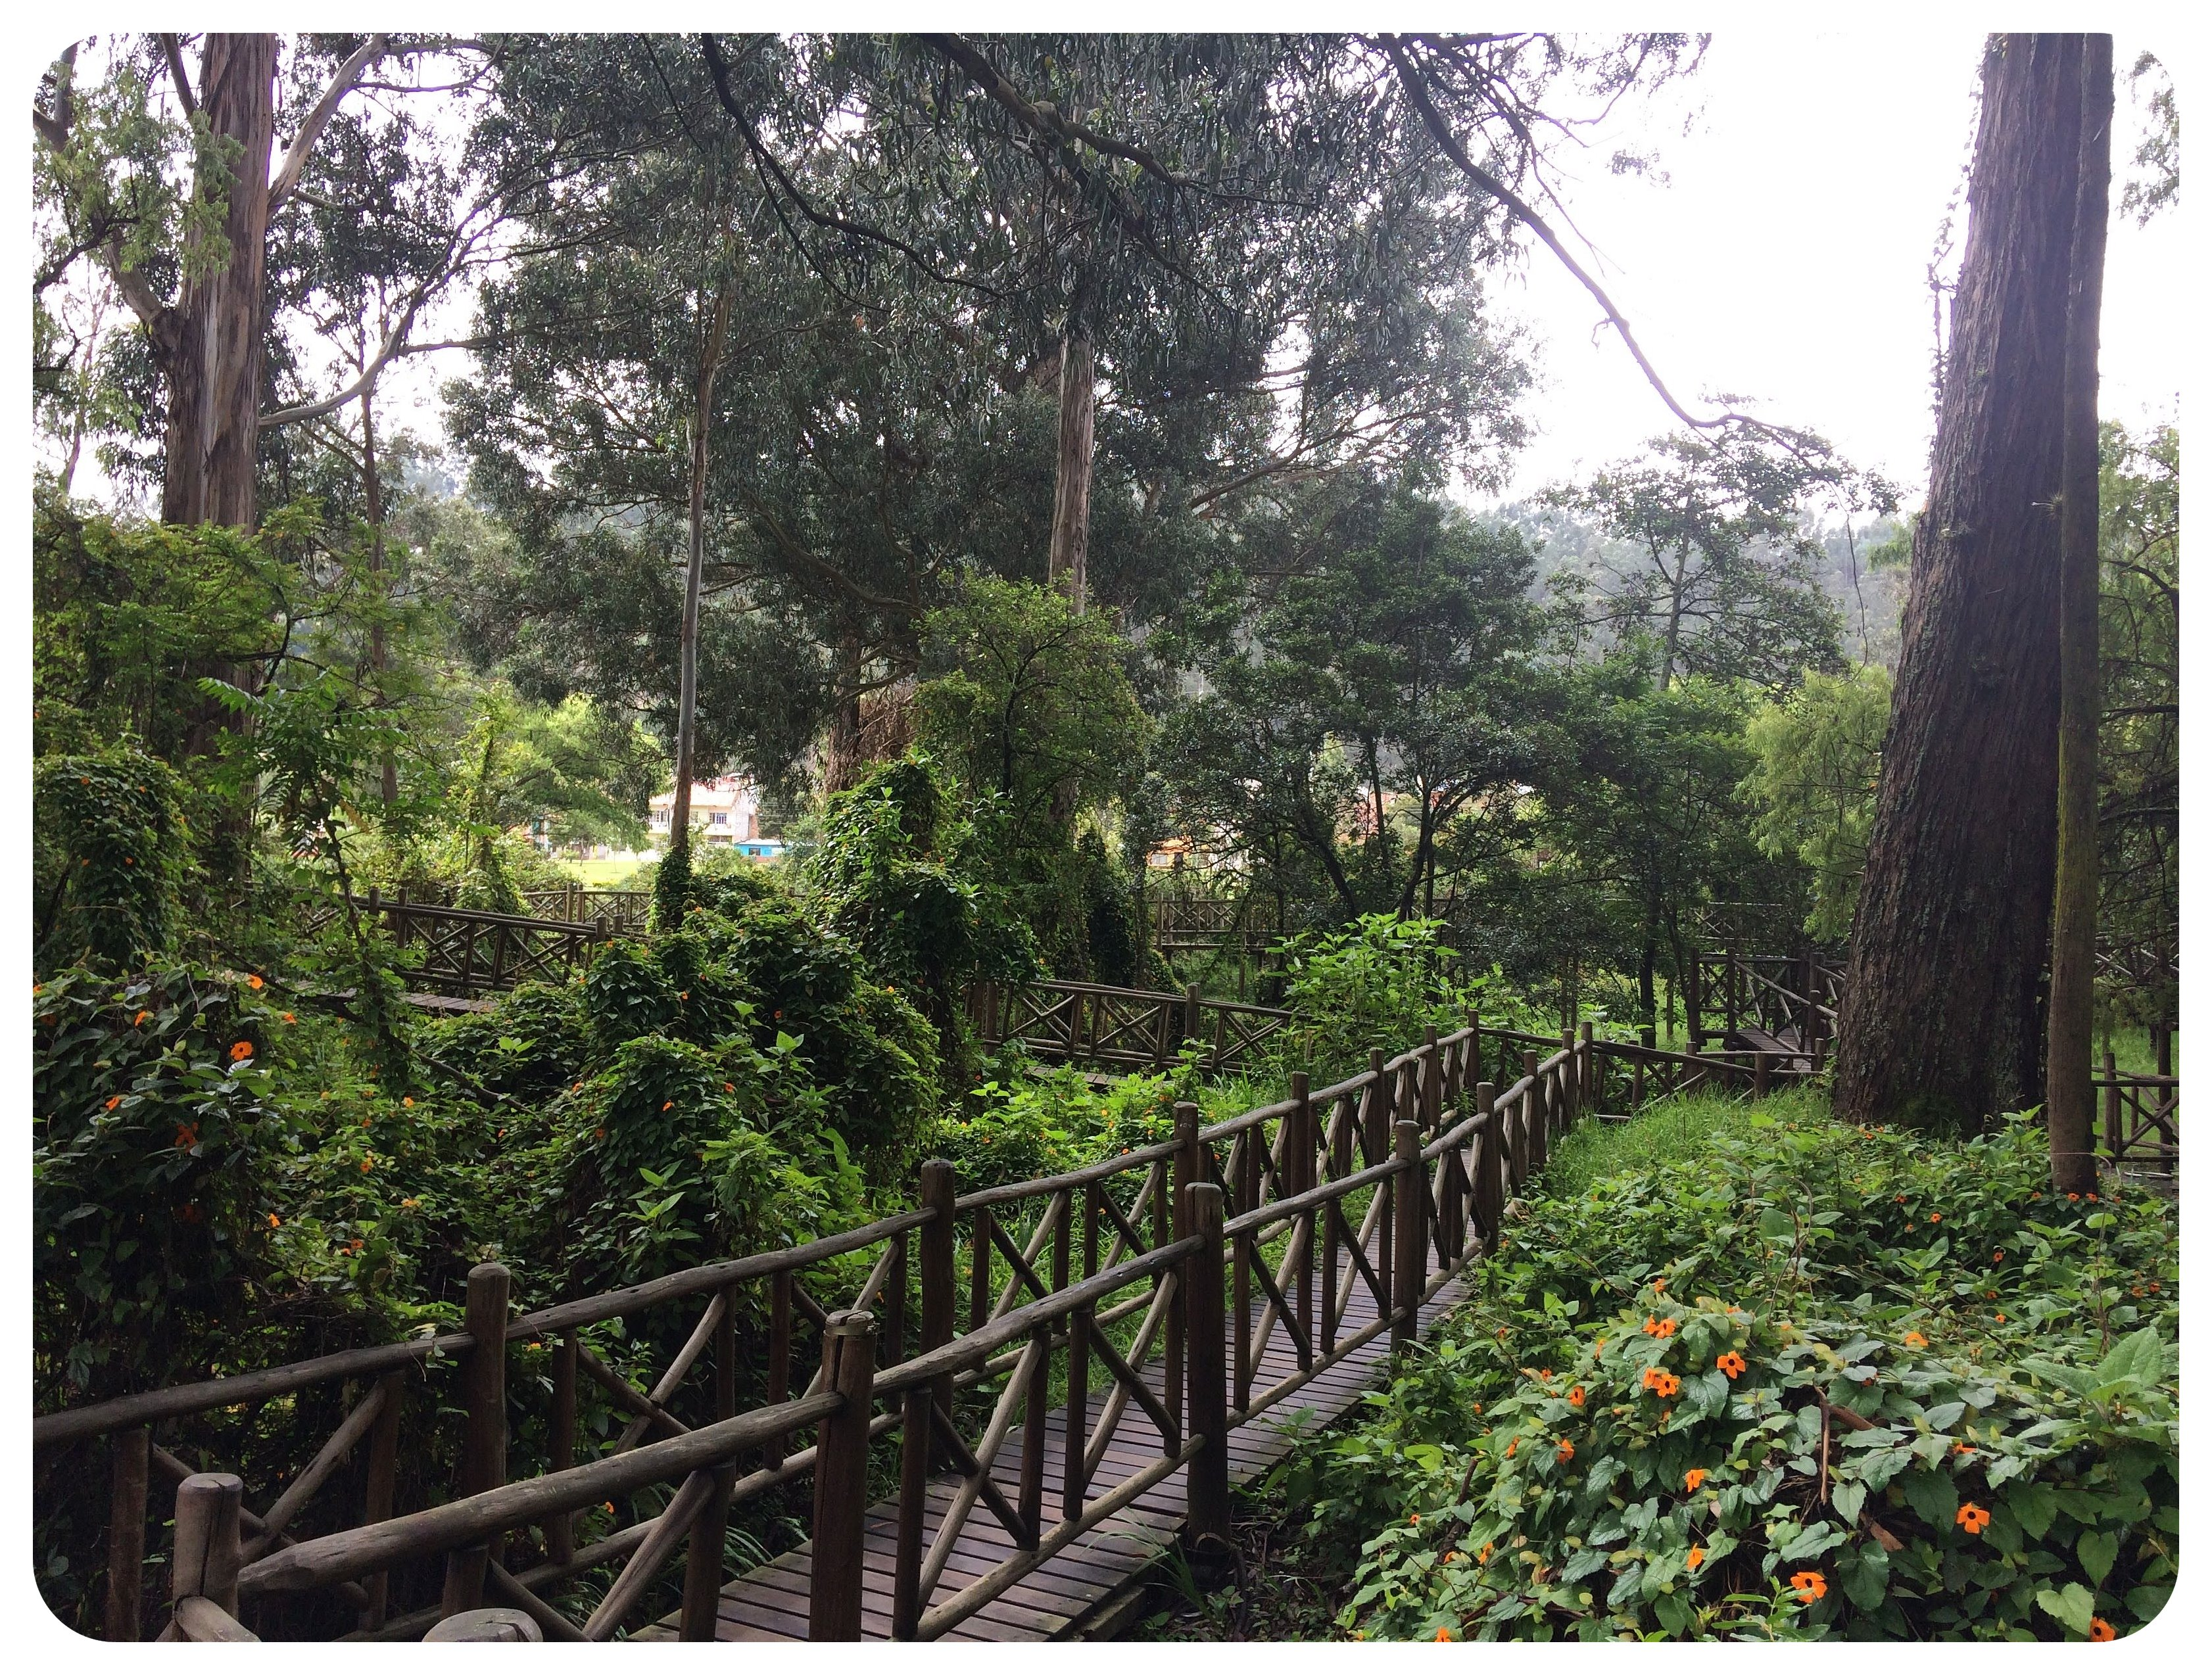 cuenca park